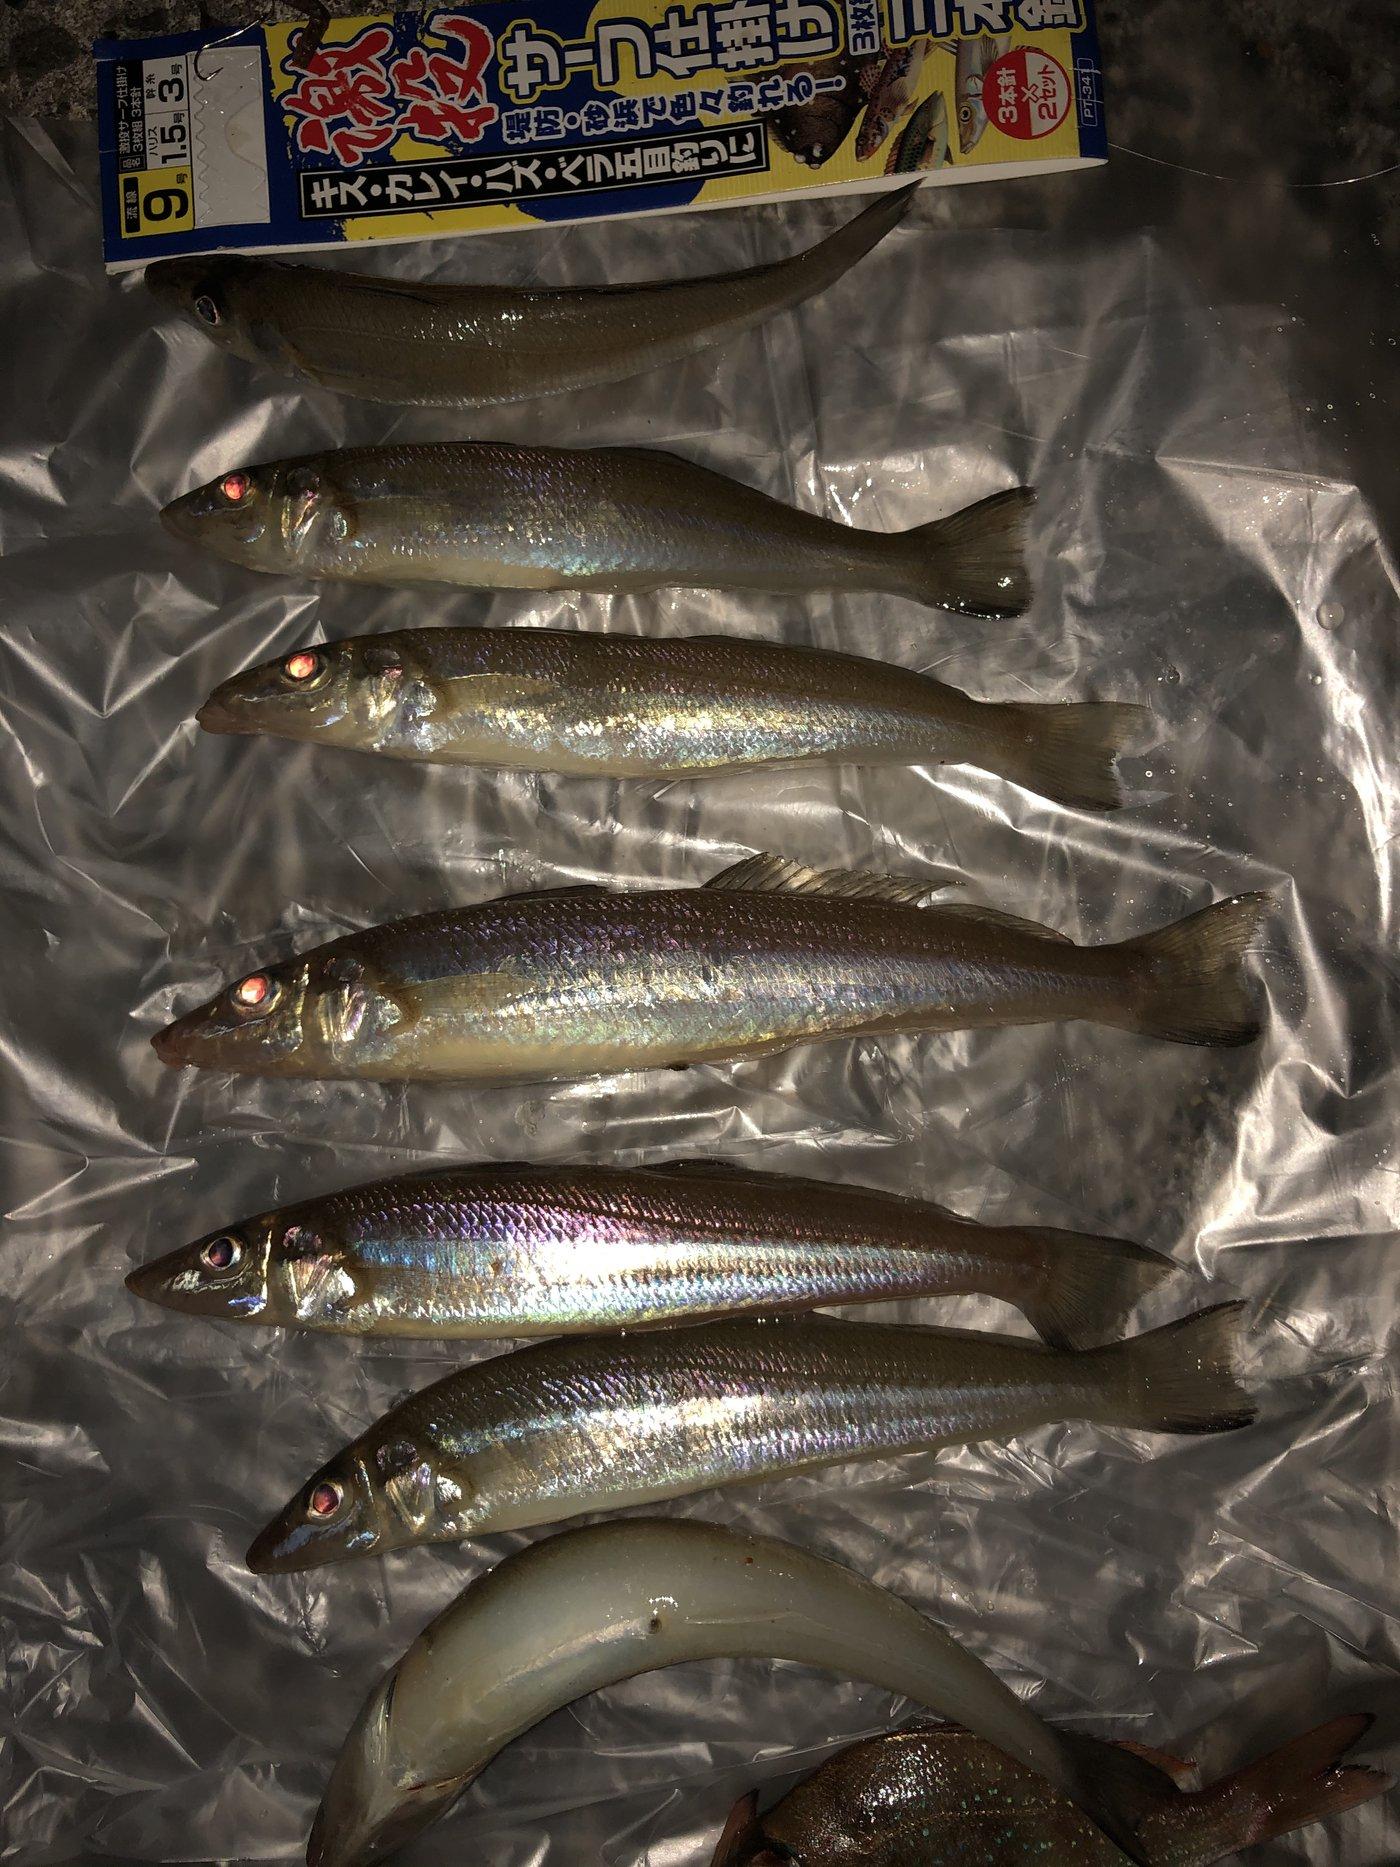 Natsuko  さんの投稿画像,写っている魚は